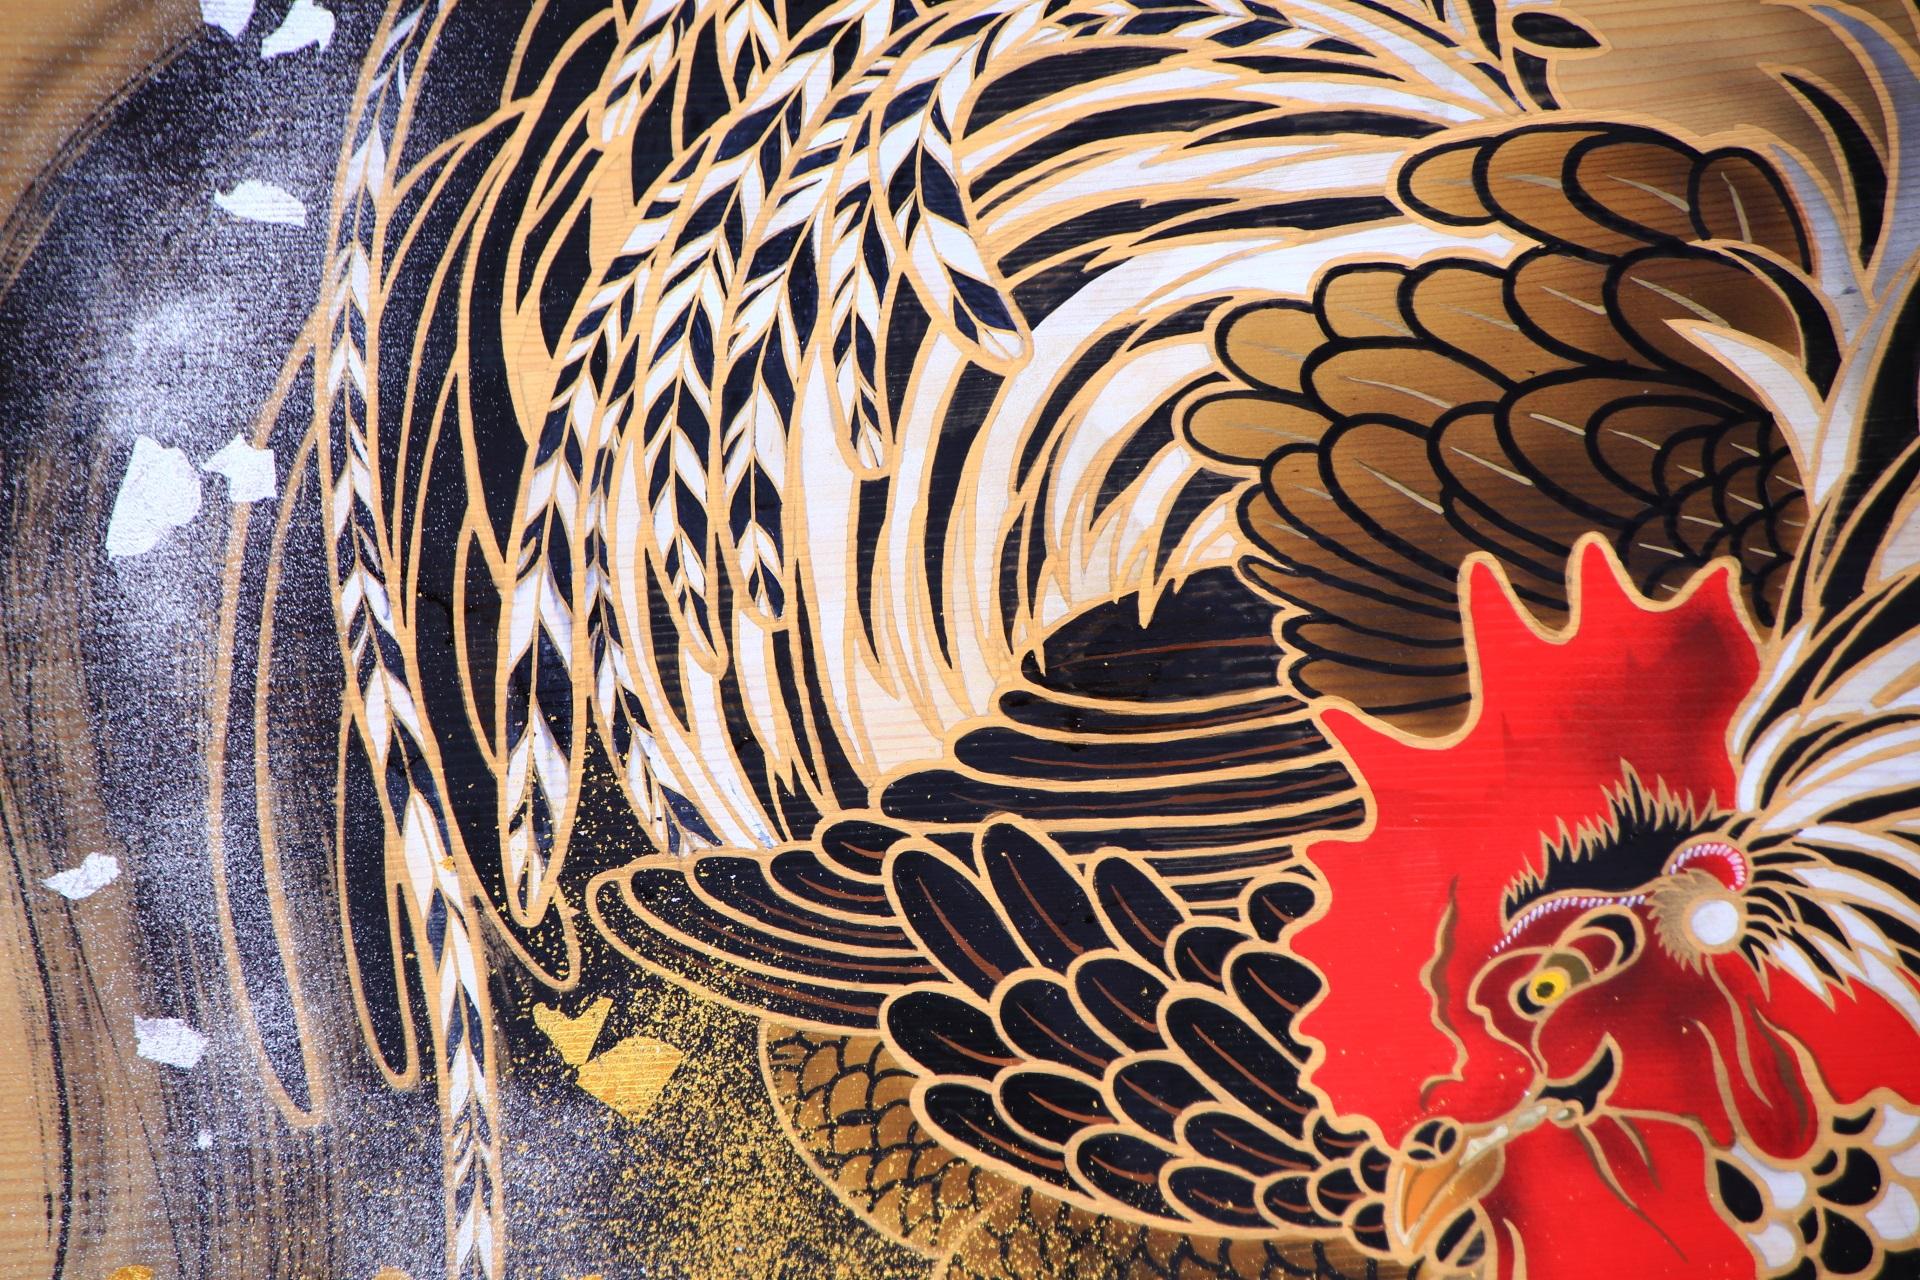 Rooster year large ema Shimogamo-jinja shrine in Kyoto,Japan